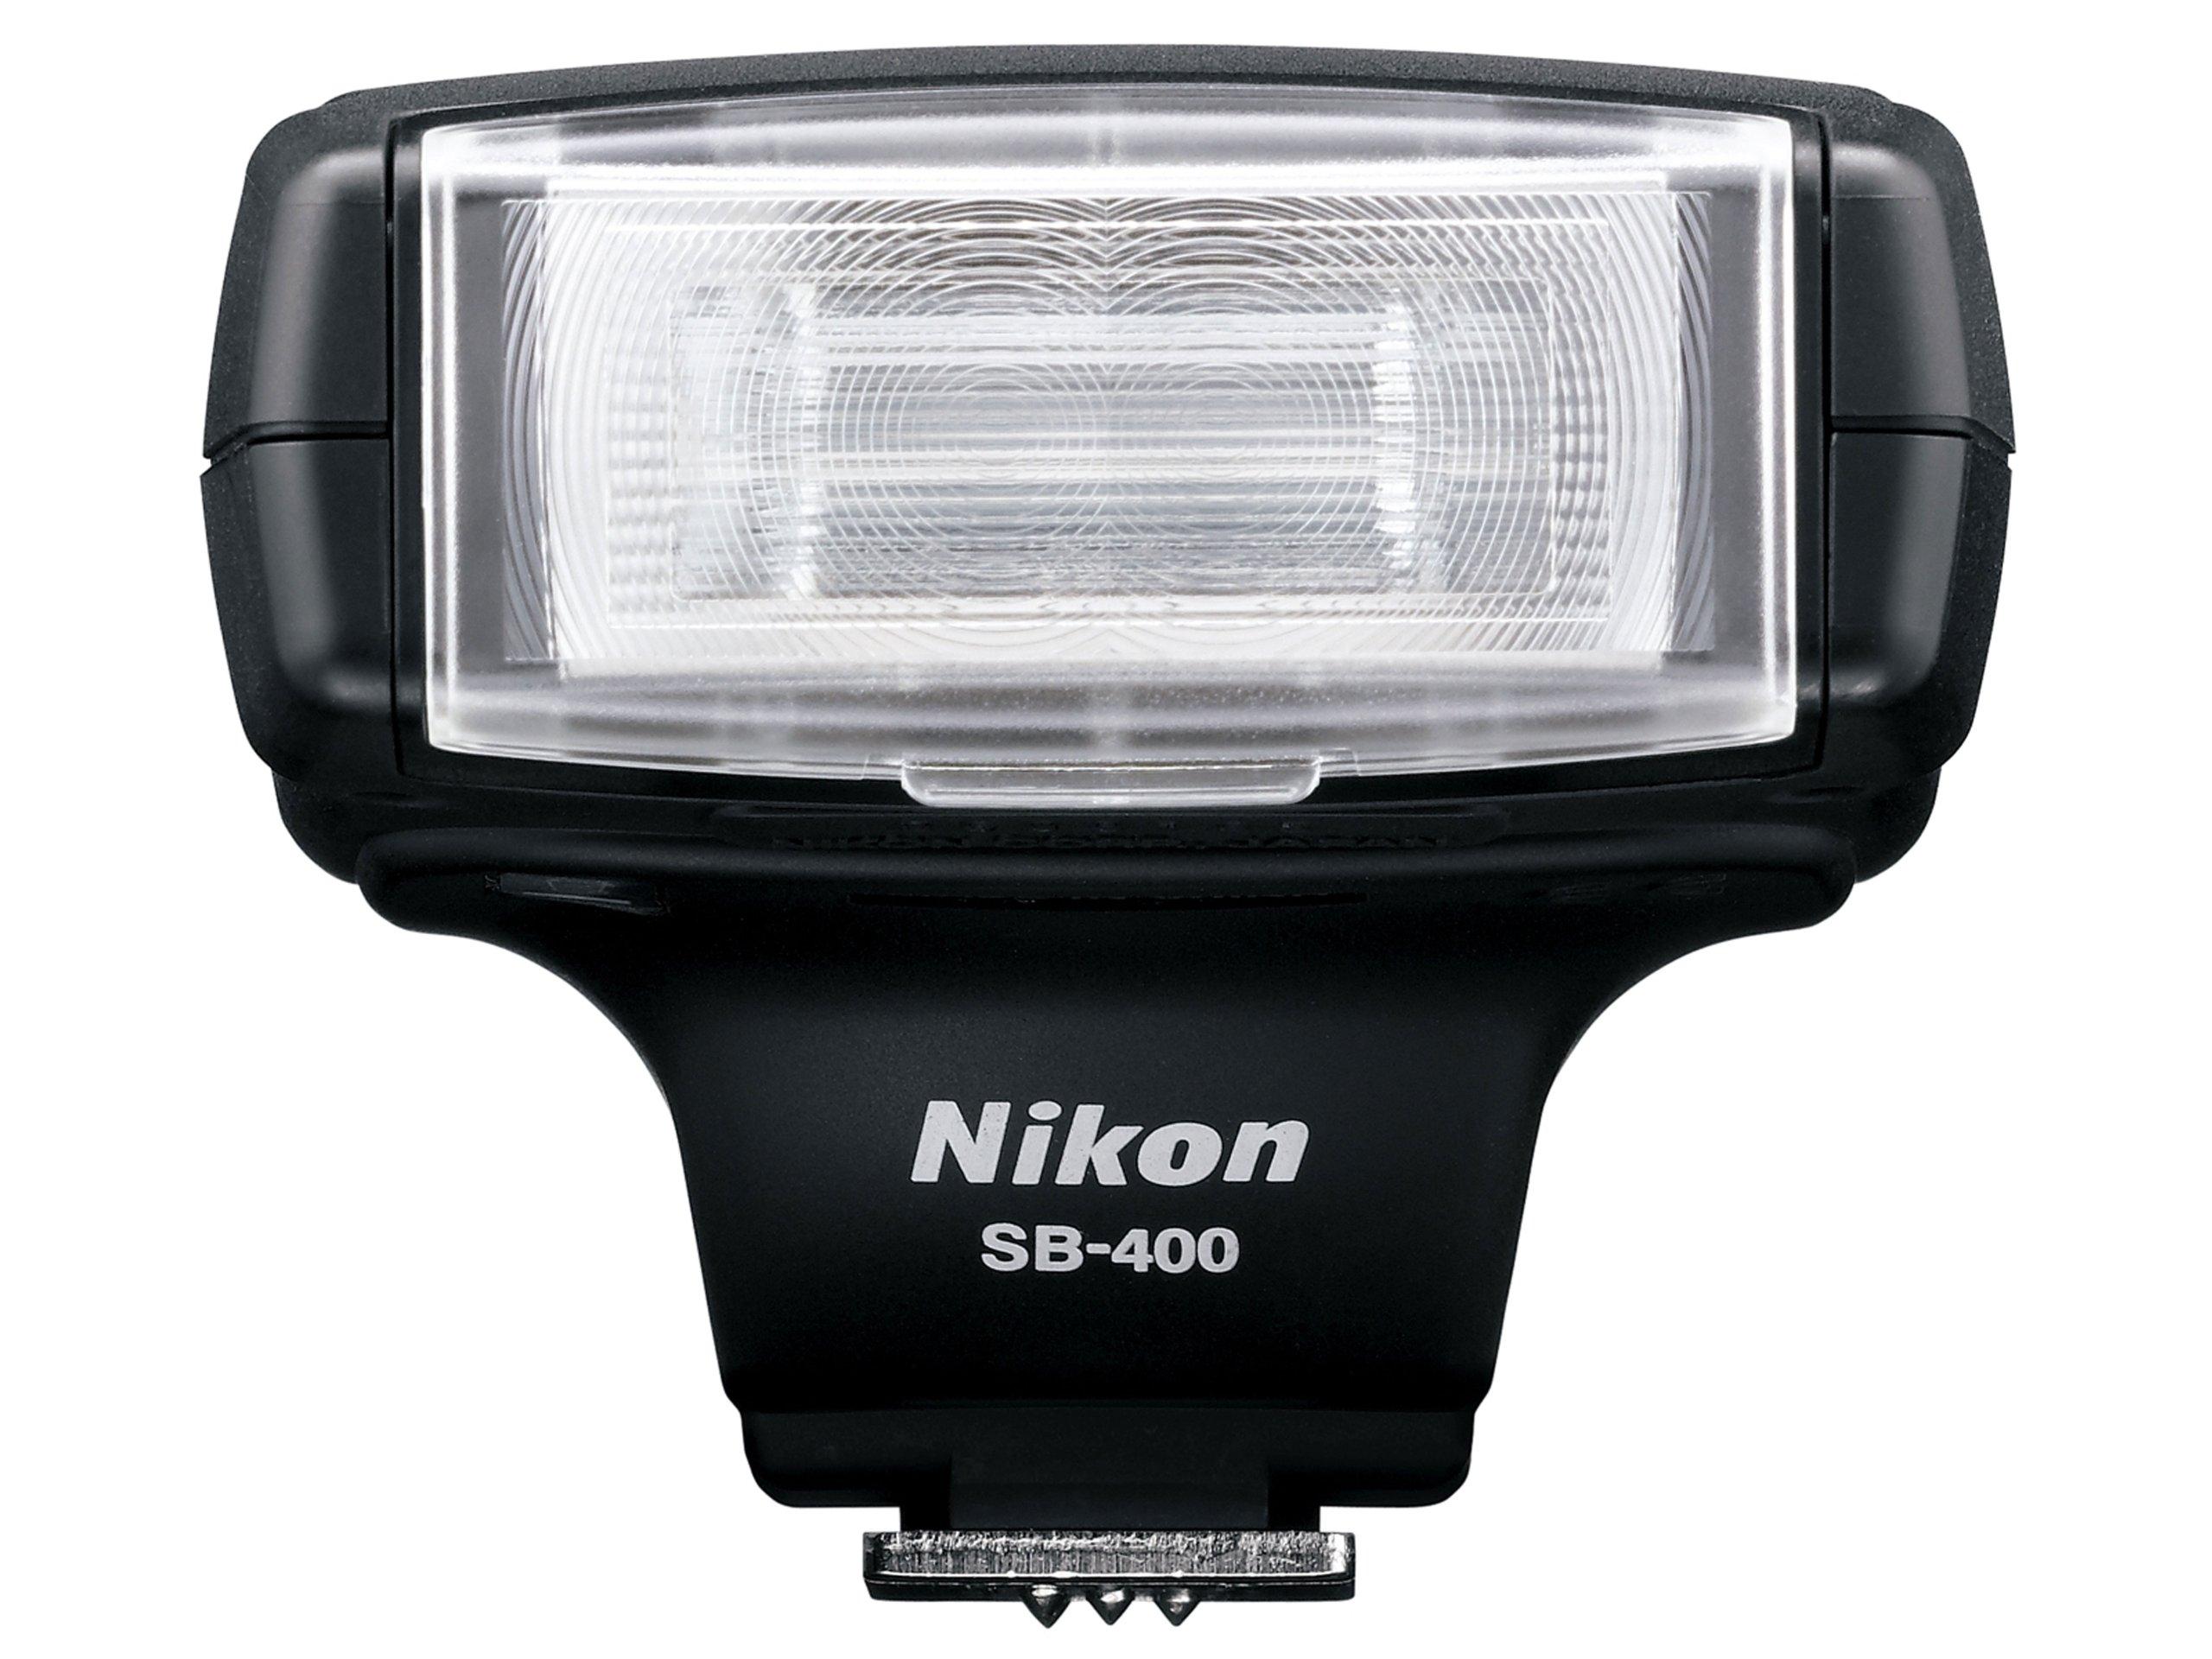 Nikon SB-400 AF Speedlight Flash for Nikon Digital SLR Cameras by Nikon